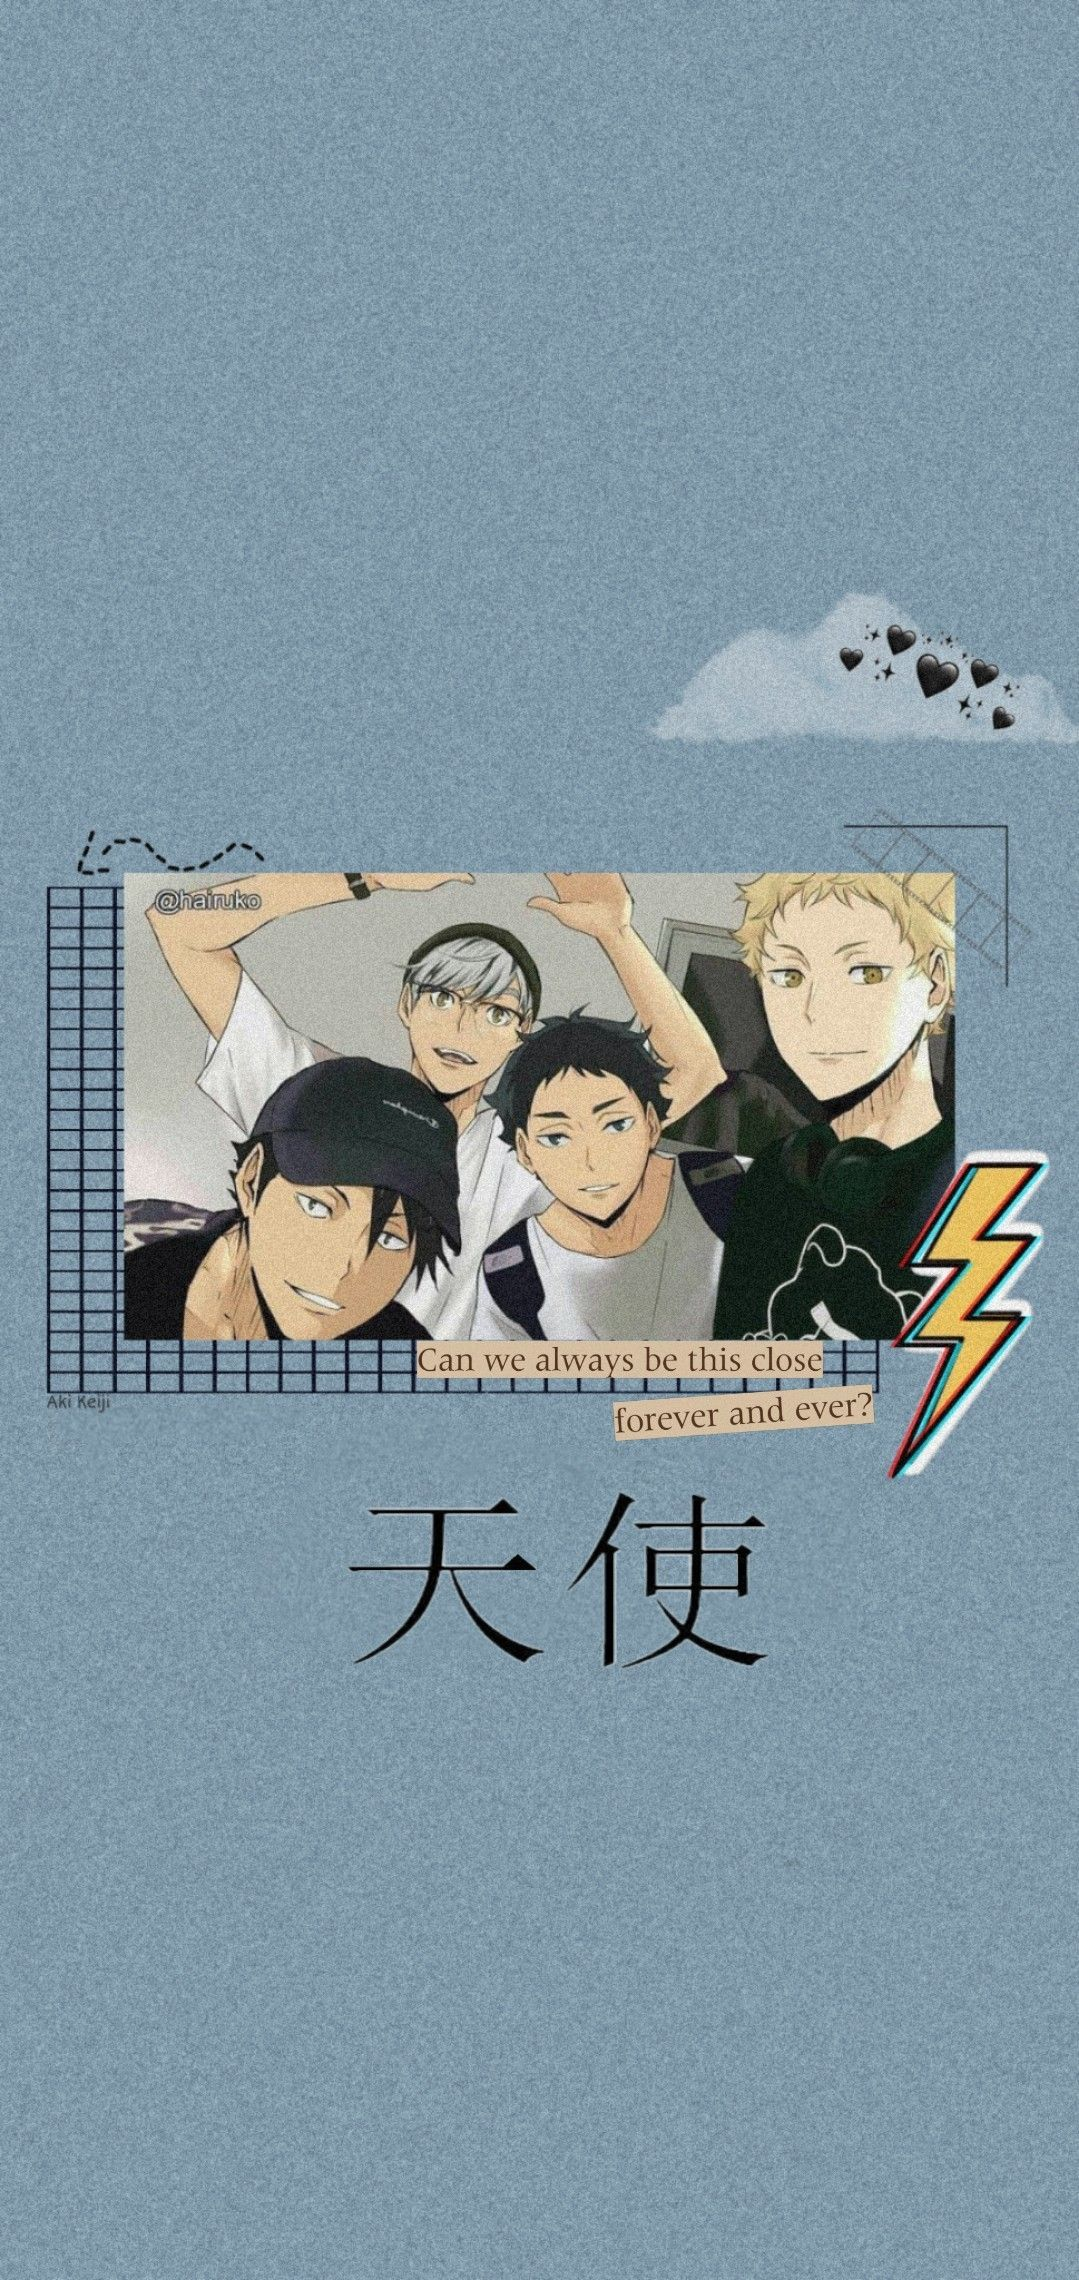 haikyuu wallpaper haikyuu anime cute